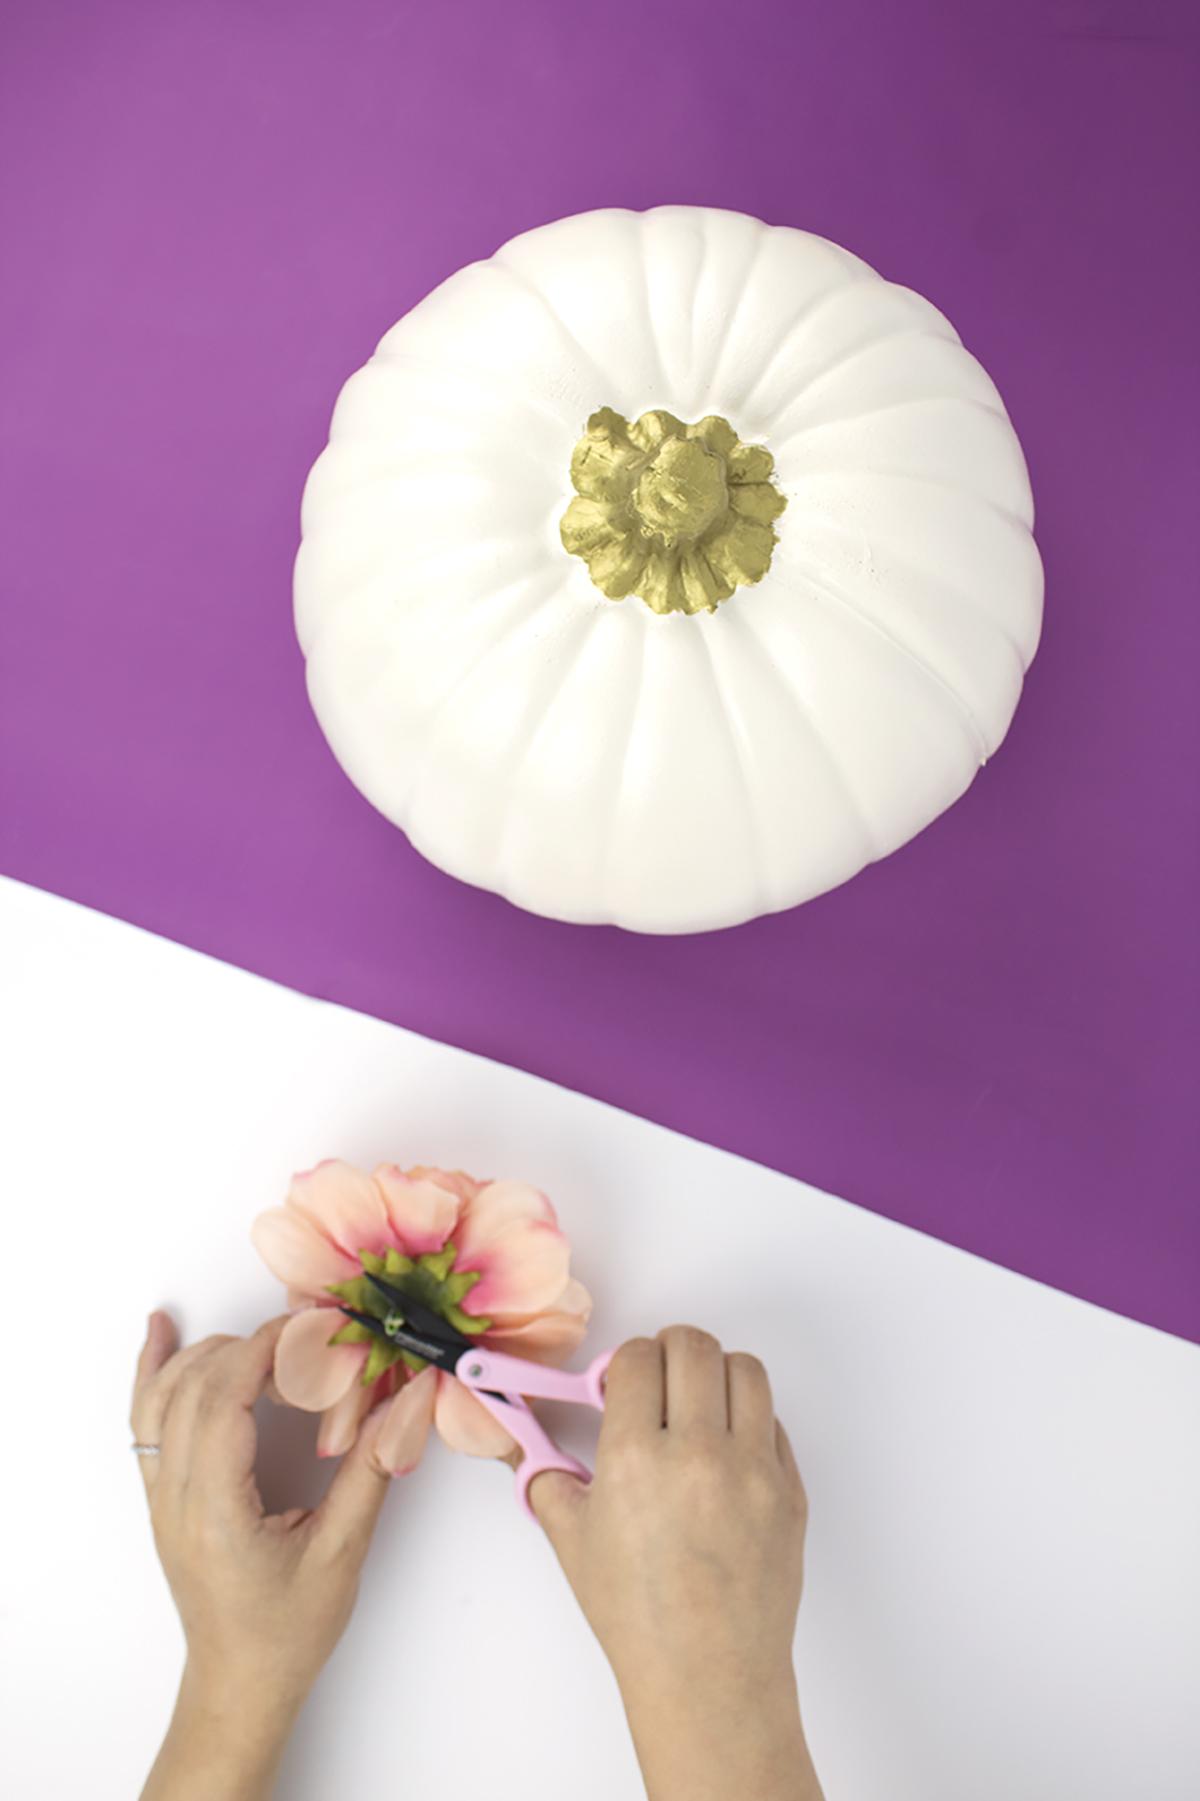 DIY Painted Pumpkins Step 2 cut the stem off your flower